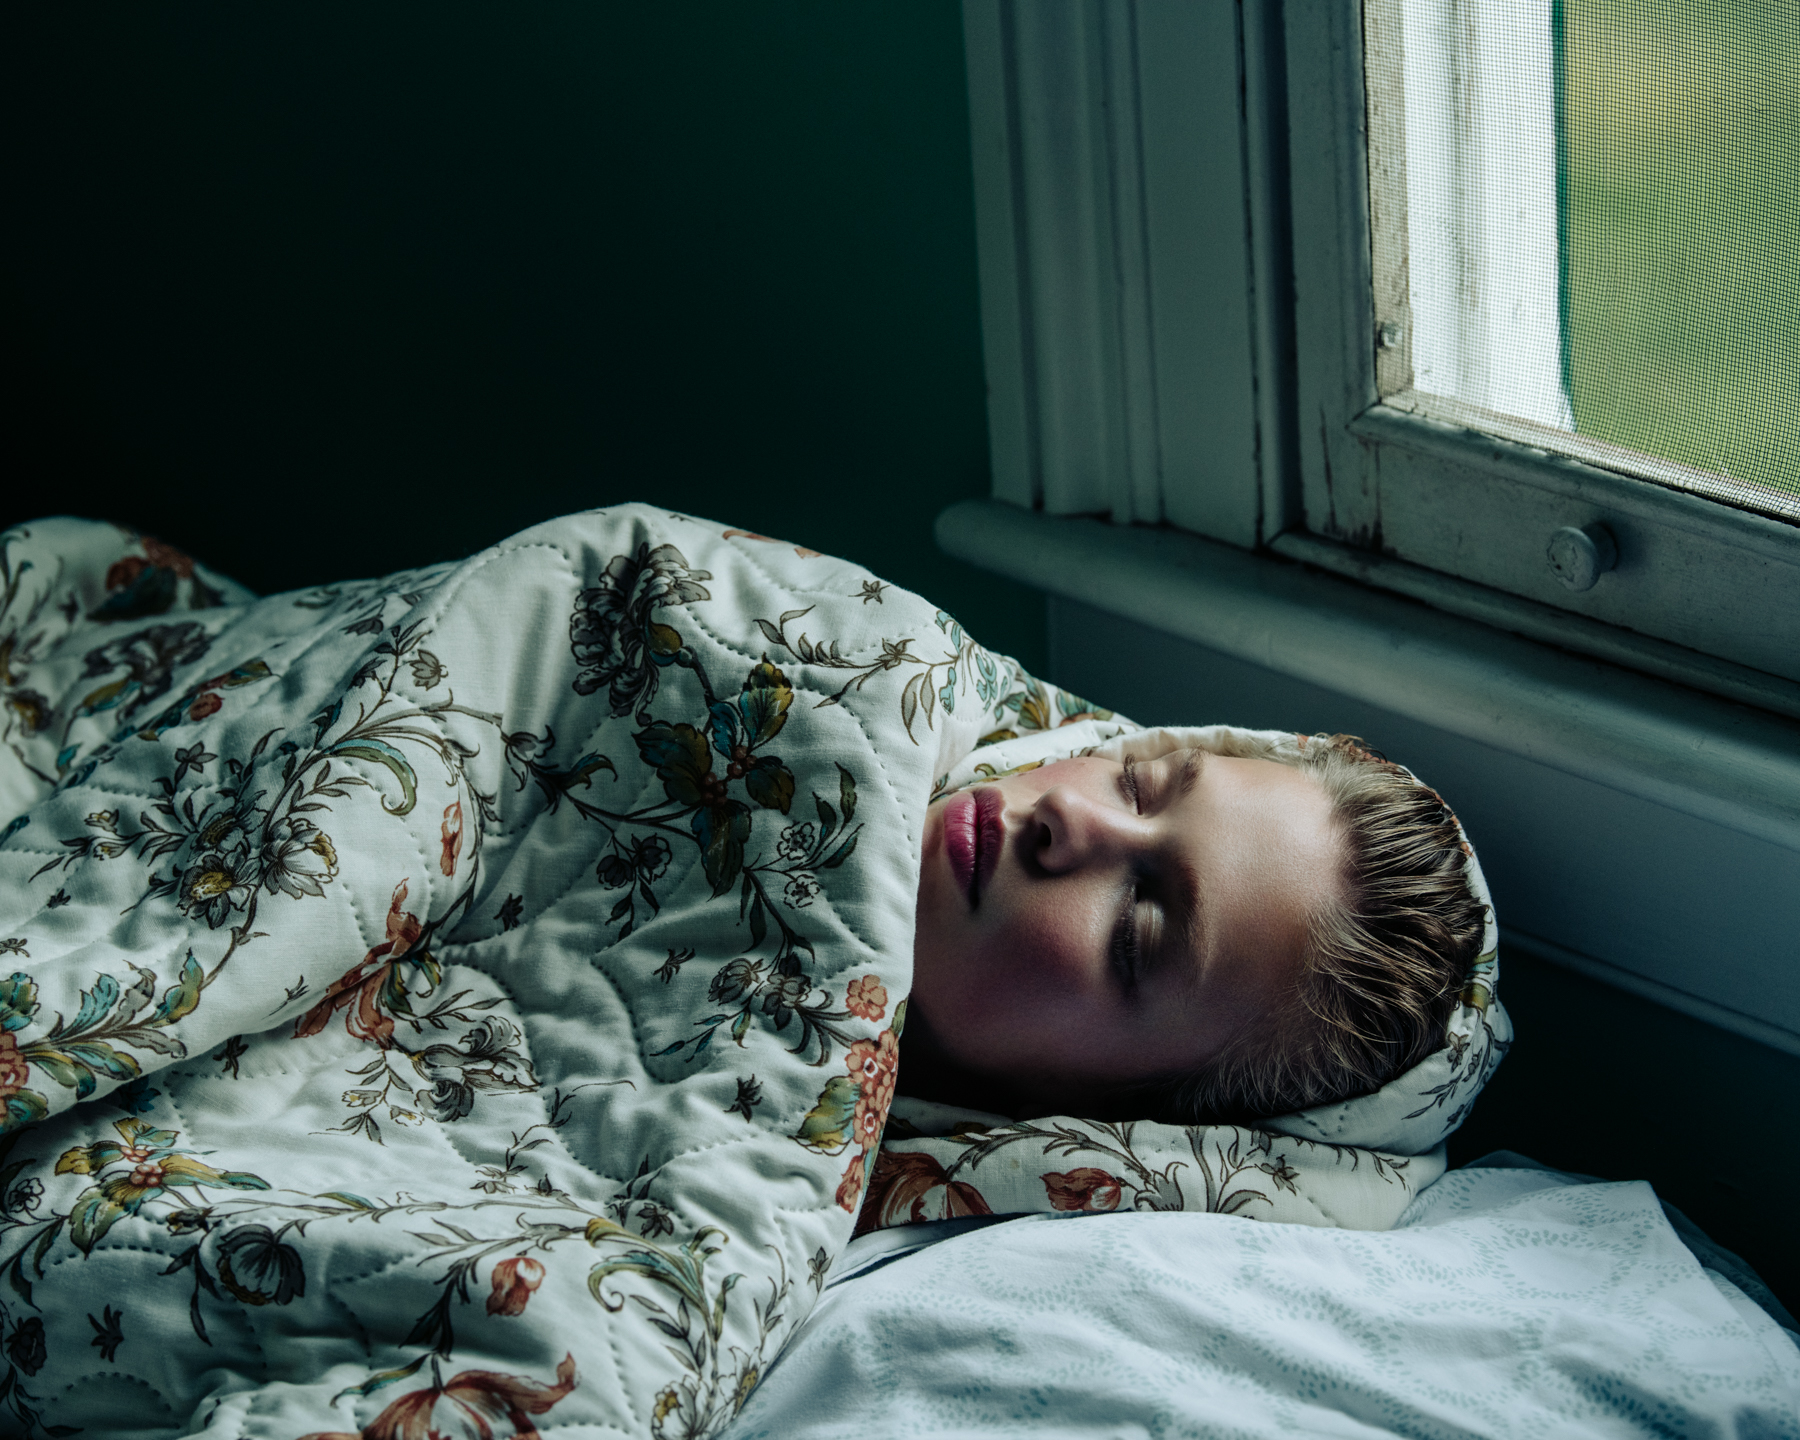 09-Clare-Crawford-by-Ivan-Bideac-for-Vogue-Italia-3925.jpg